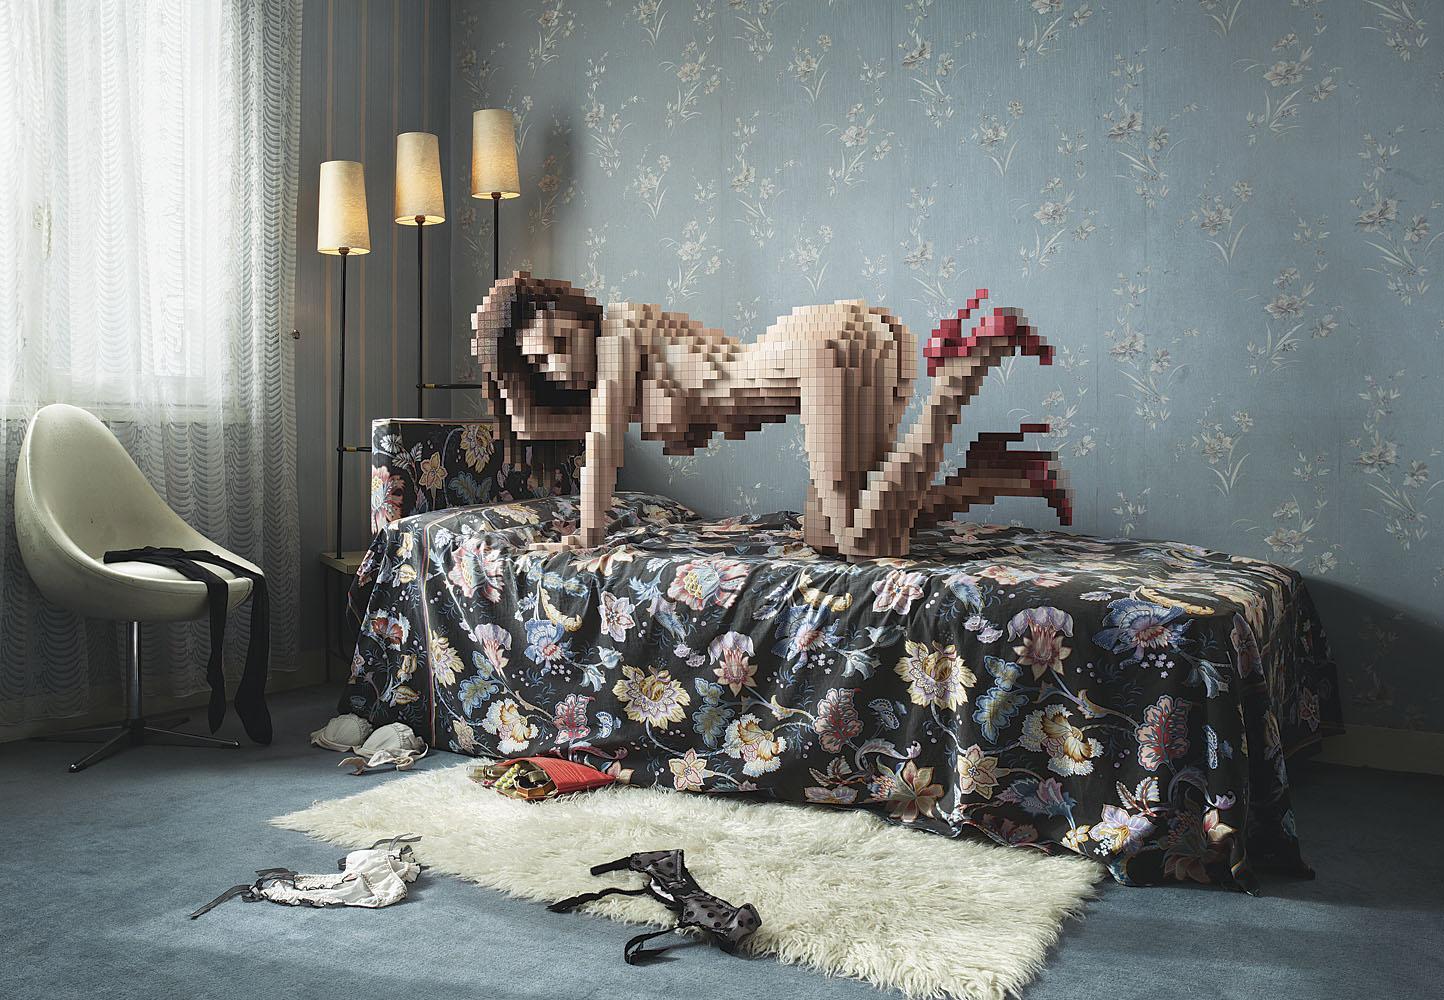 JeanYves Lemoigne photographer